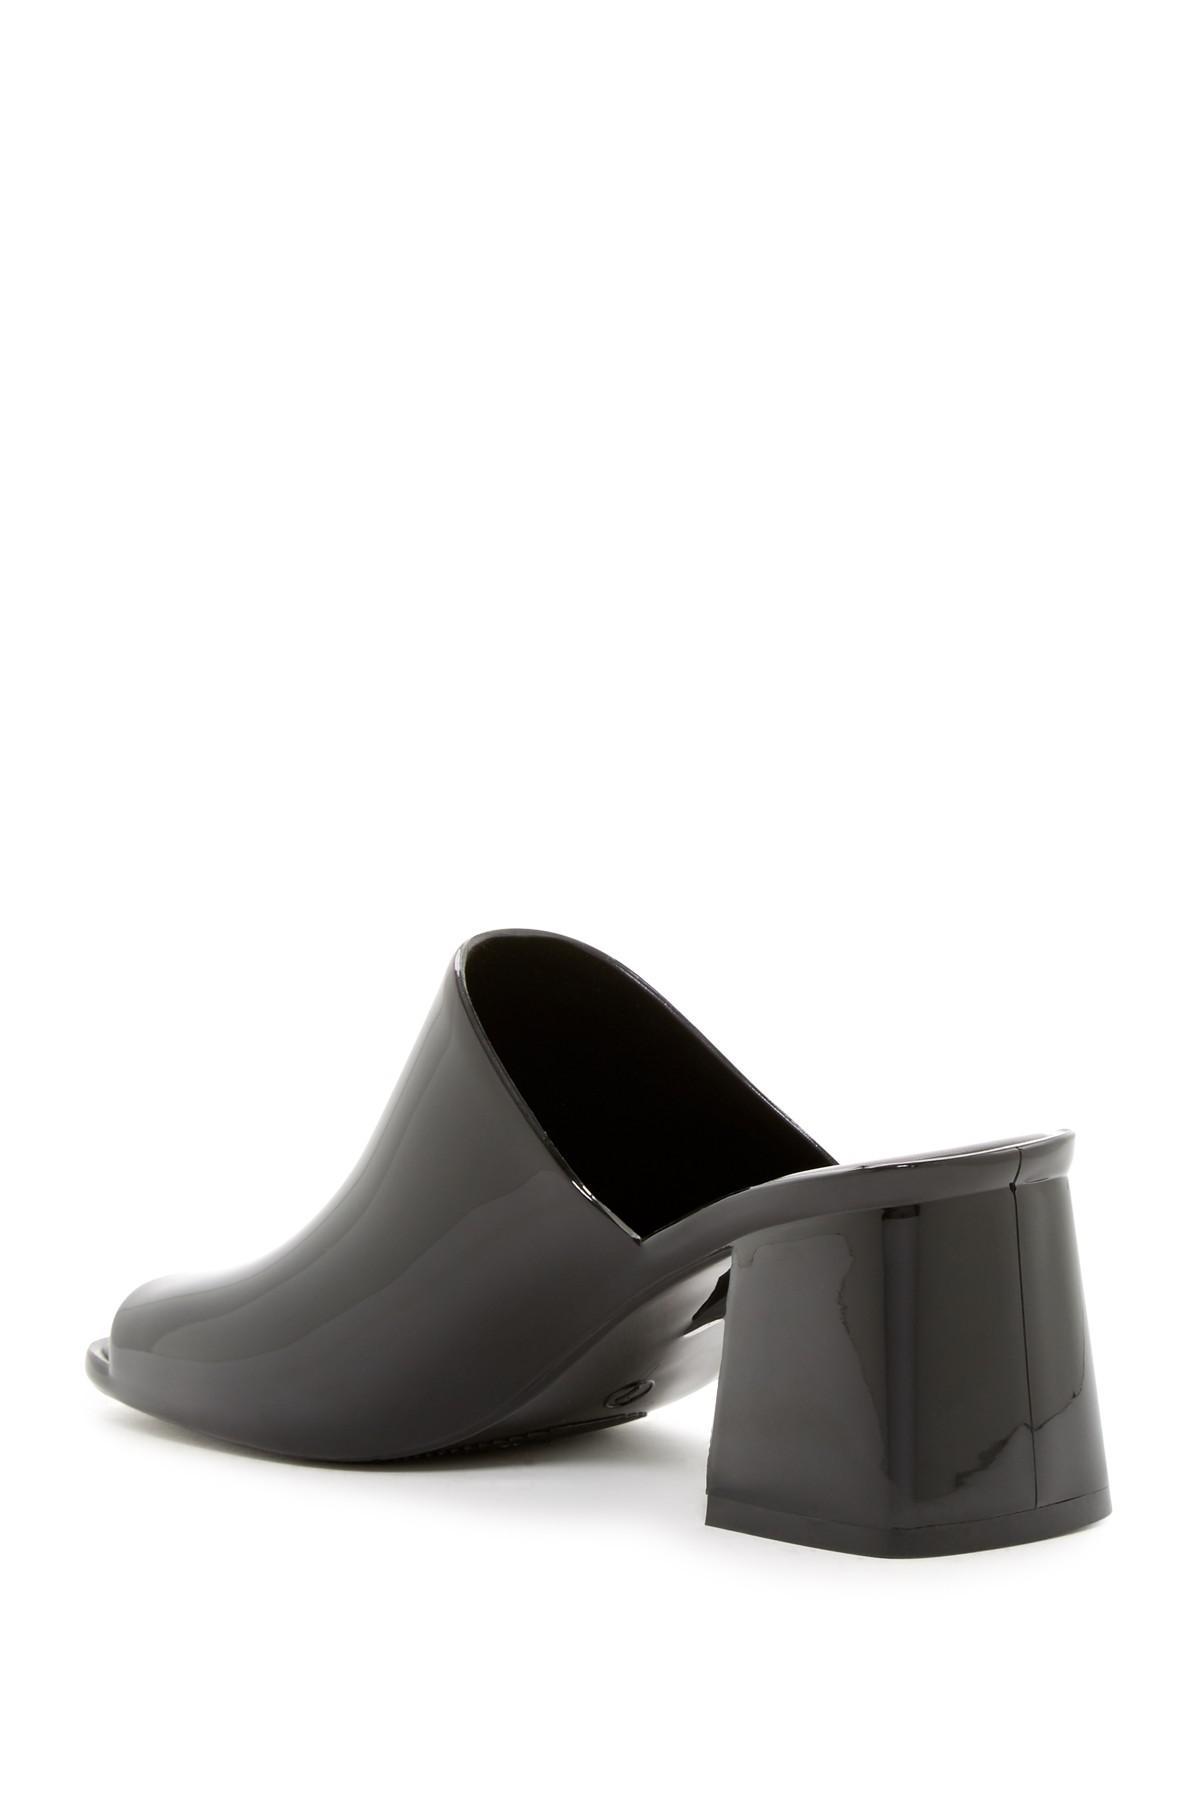 c8289c237a50 Lyst - Jeffrey Campbell Petra Jelly Block Heel Mule in Black